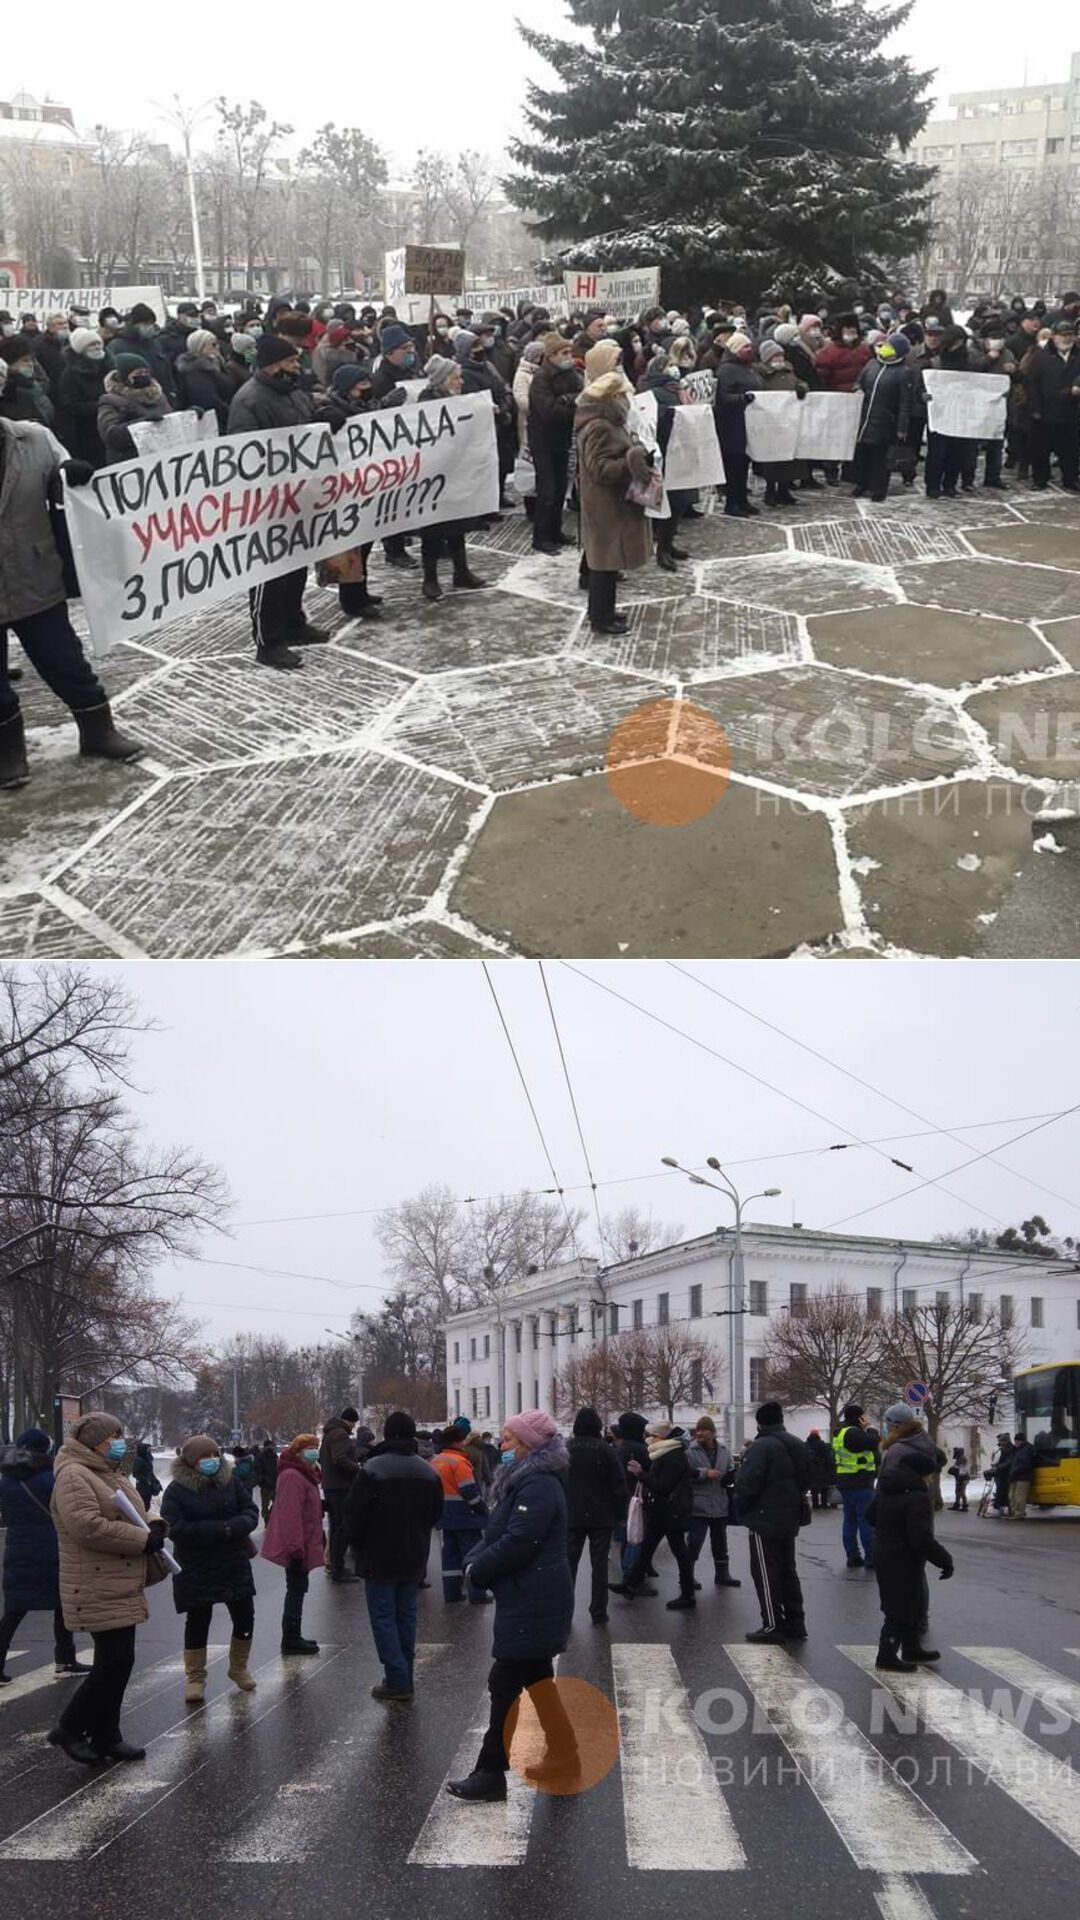 Акция протеста в Полтаве